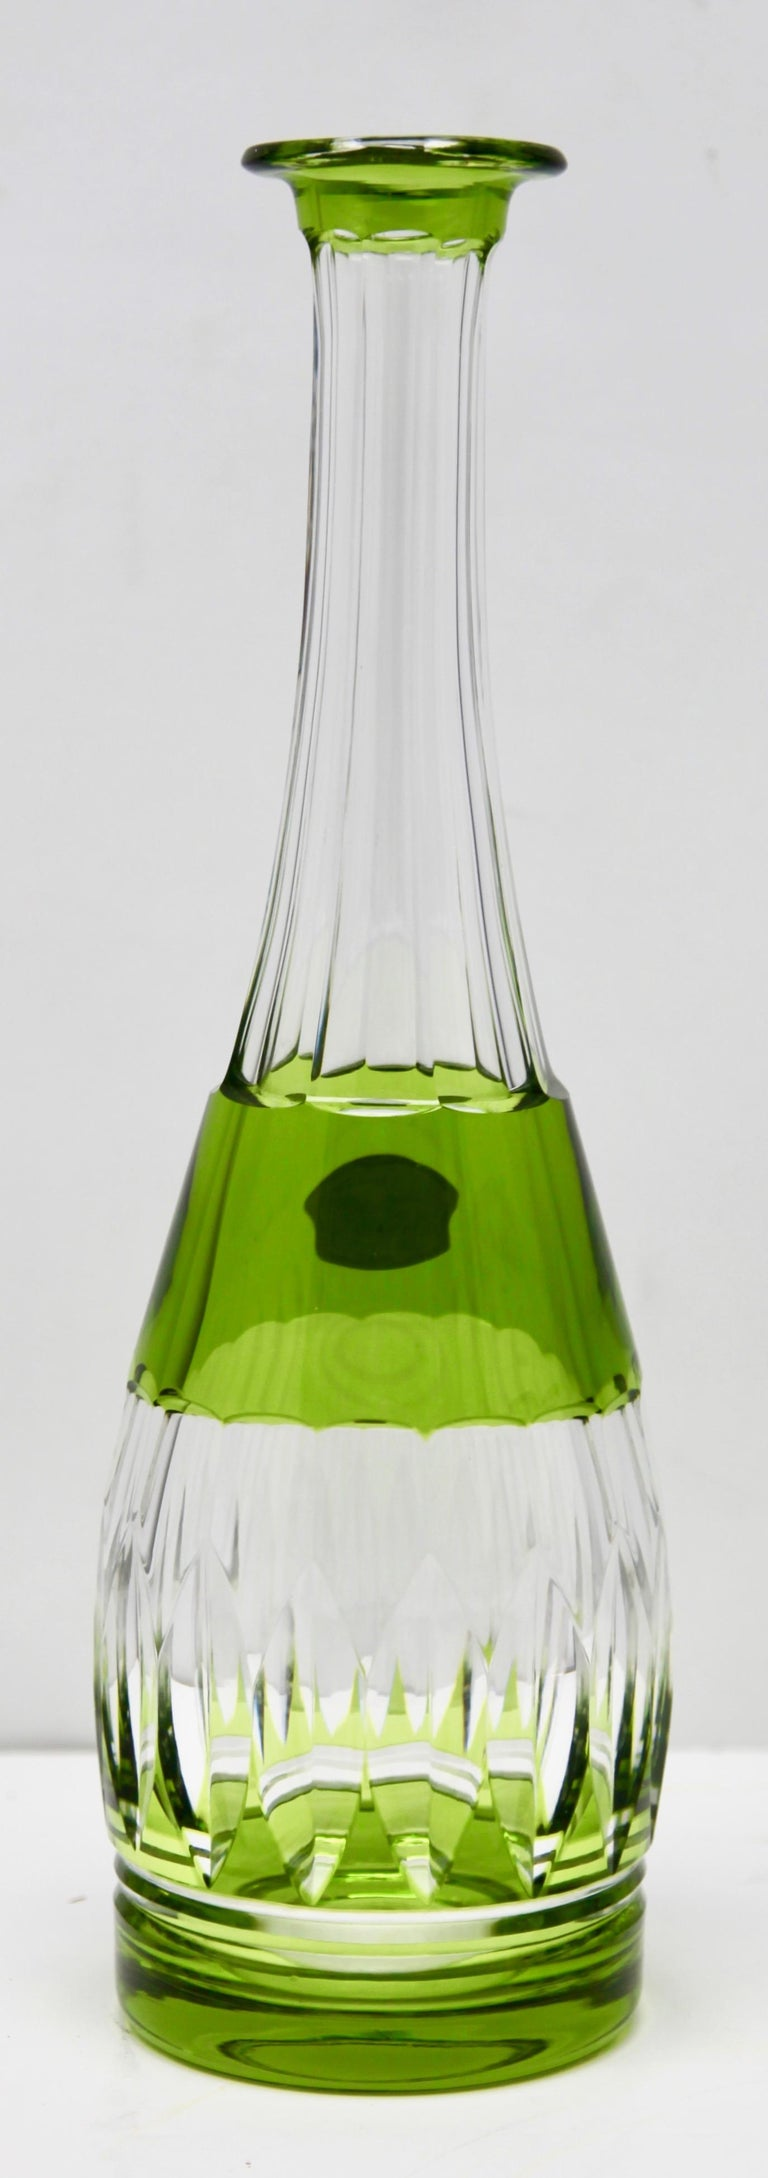 Val Saint Lambert Crystal Decanter, 6 Crystal Wine Goblets Handcut, 1950s For Sale 11